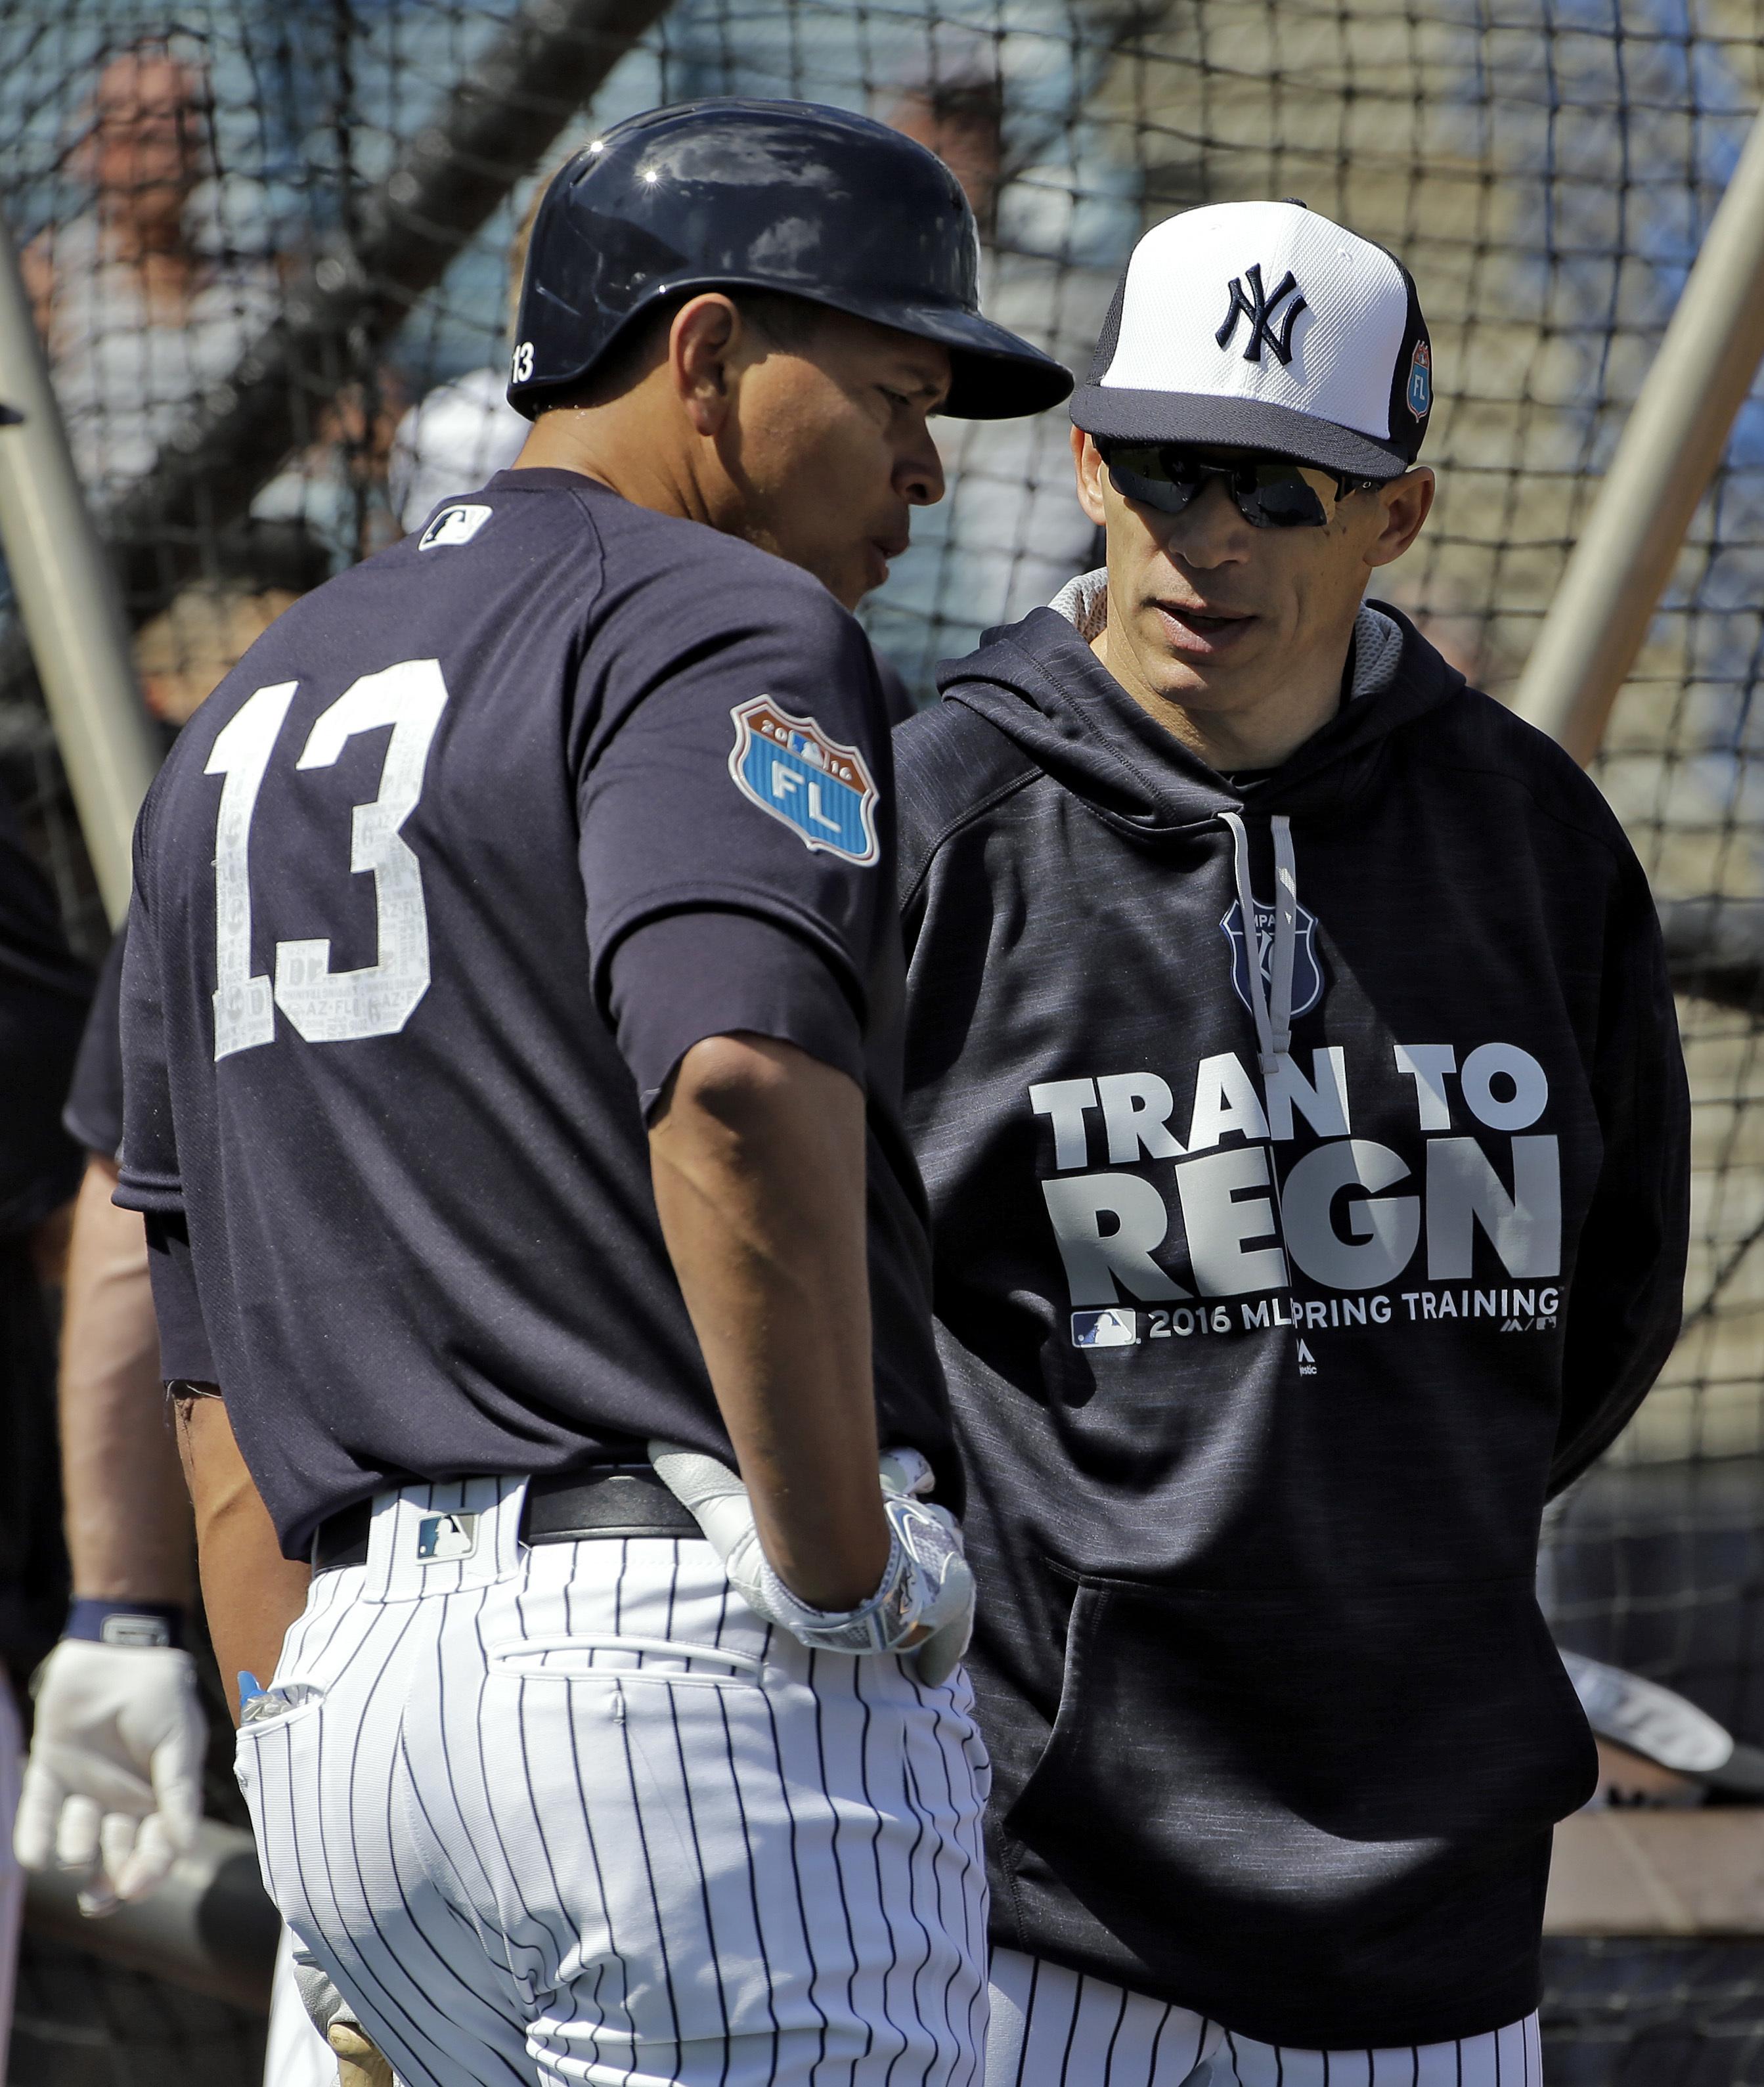 New York Yankees Joe Girardi, right, talks to Alex Rodriguez during a spring training baseball workout Thursday, Feb. 25, 2016, in Tampa, Fla. (AP Photo/Chris O'Meara)